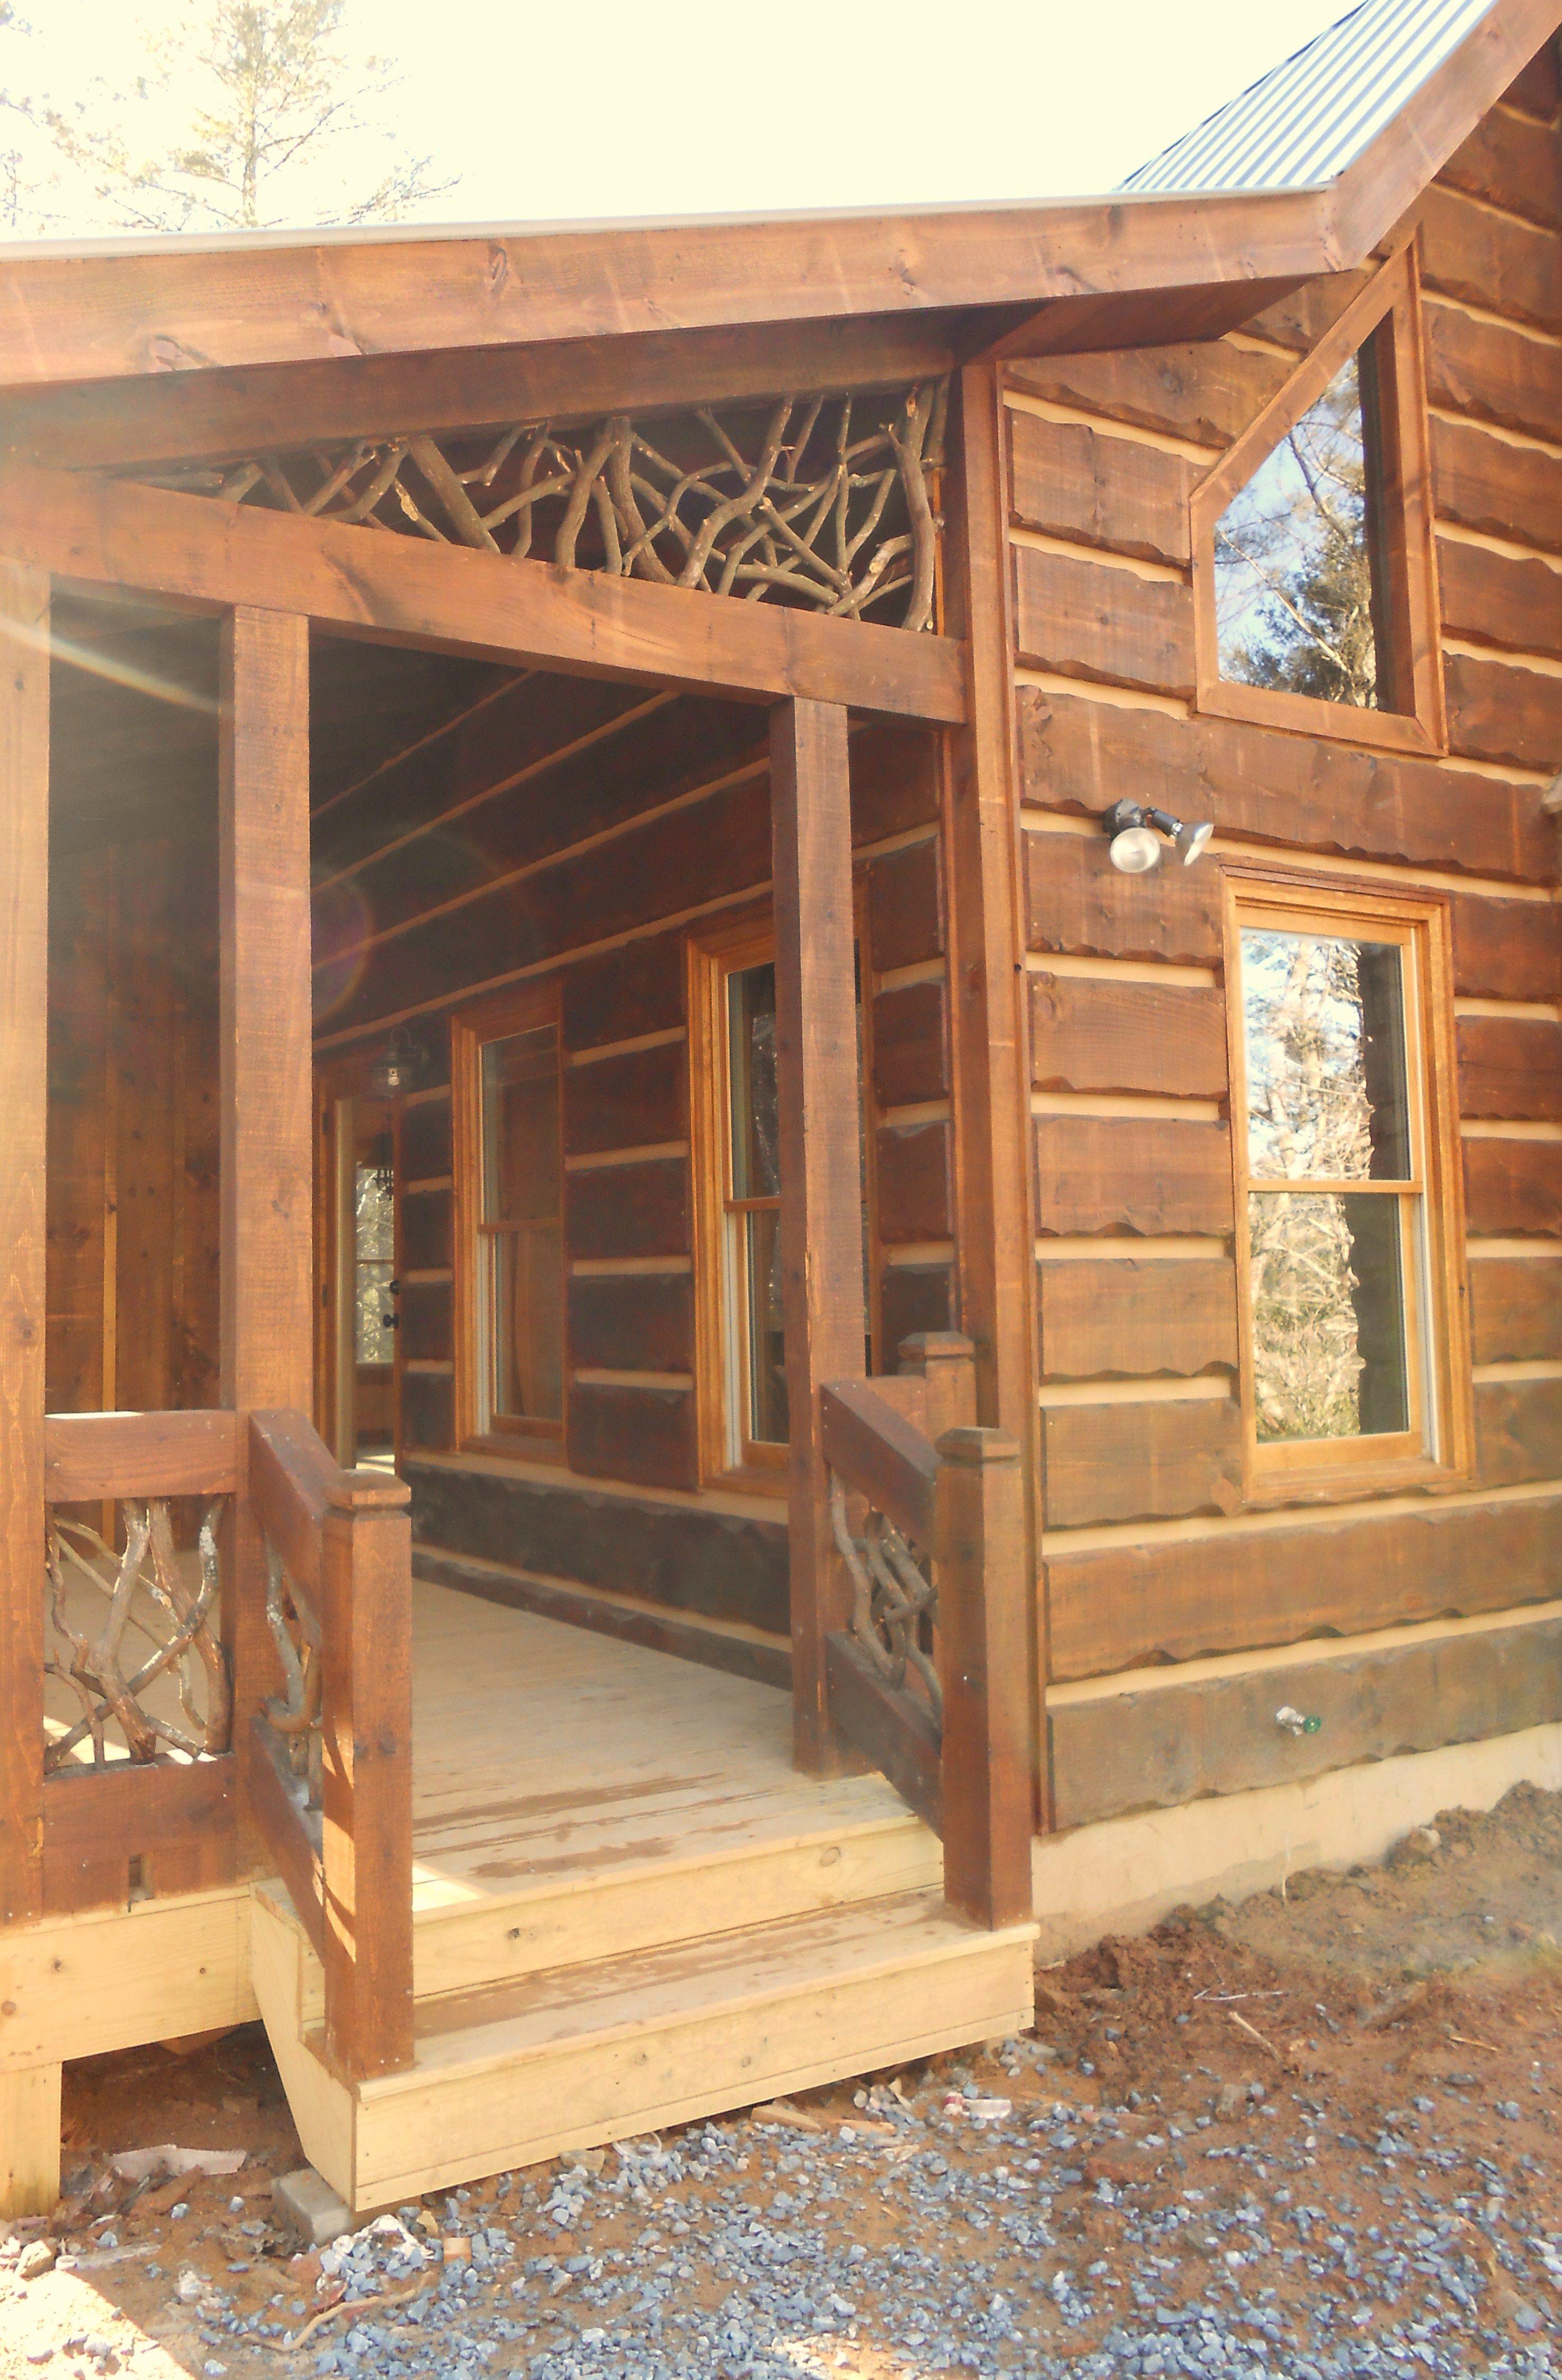 3x8 log siding hand hewn pine - Hand Scraped 2x12 Rough Sawn Siding With Perma Chink Fill